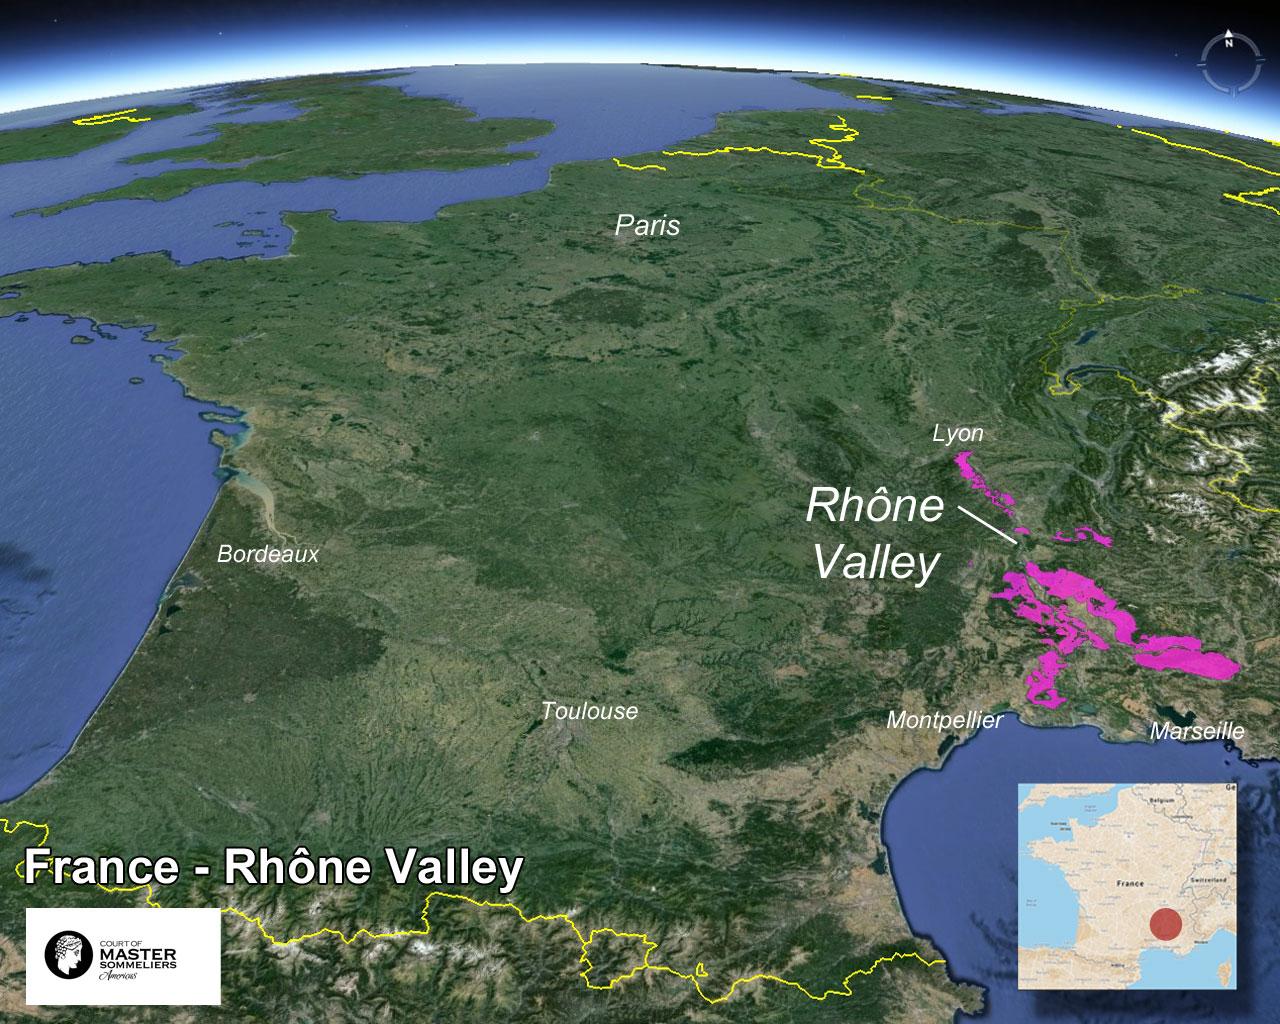 Rhone-Valley-Overview.jpg